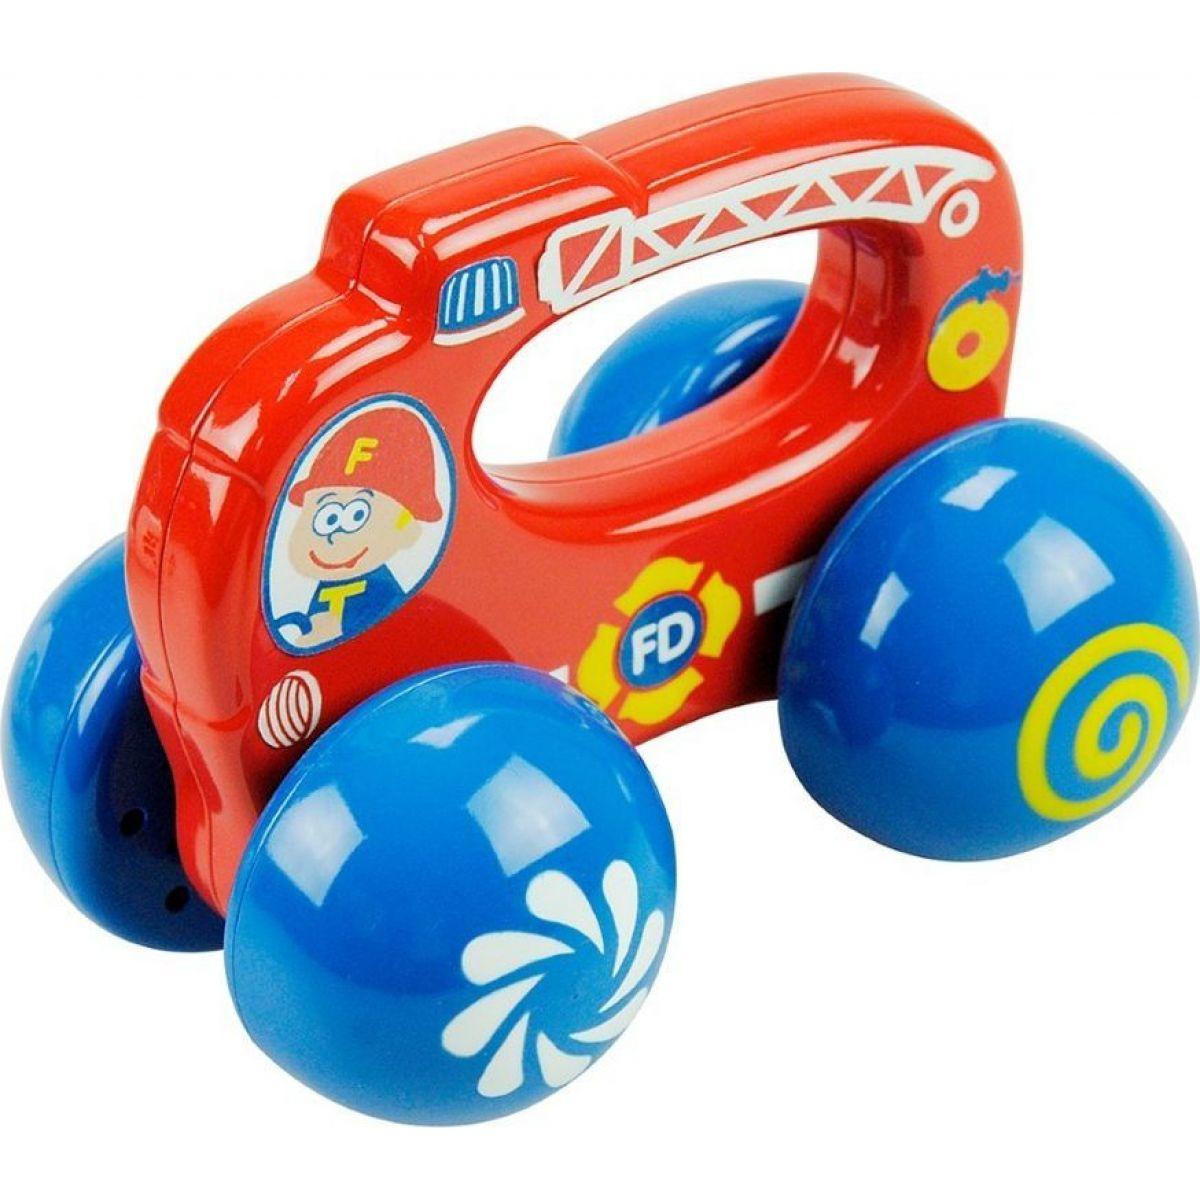 Playgo Hrkajúca autíčko Hasiči